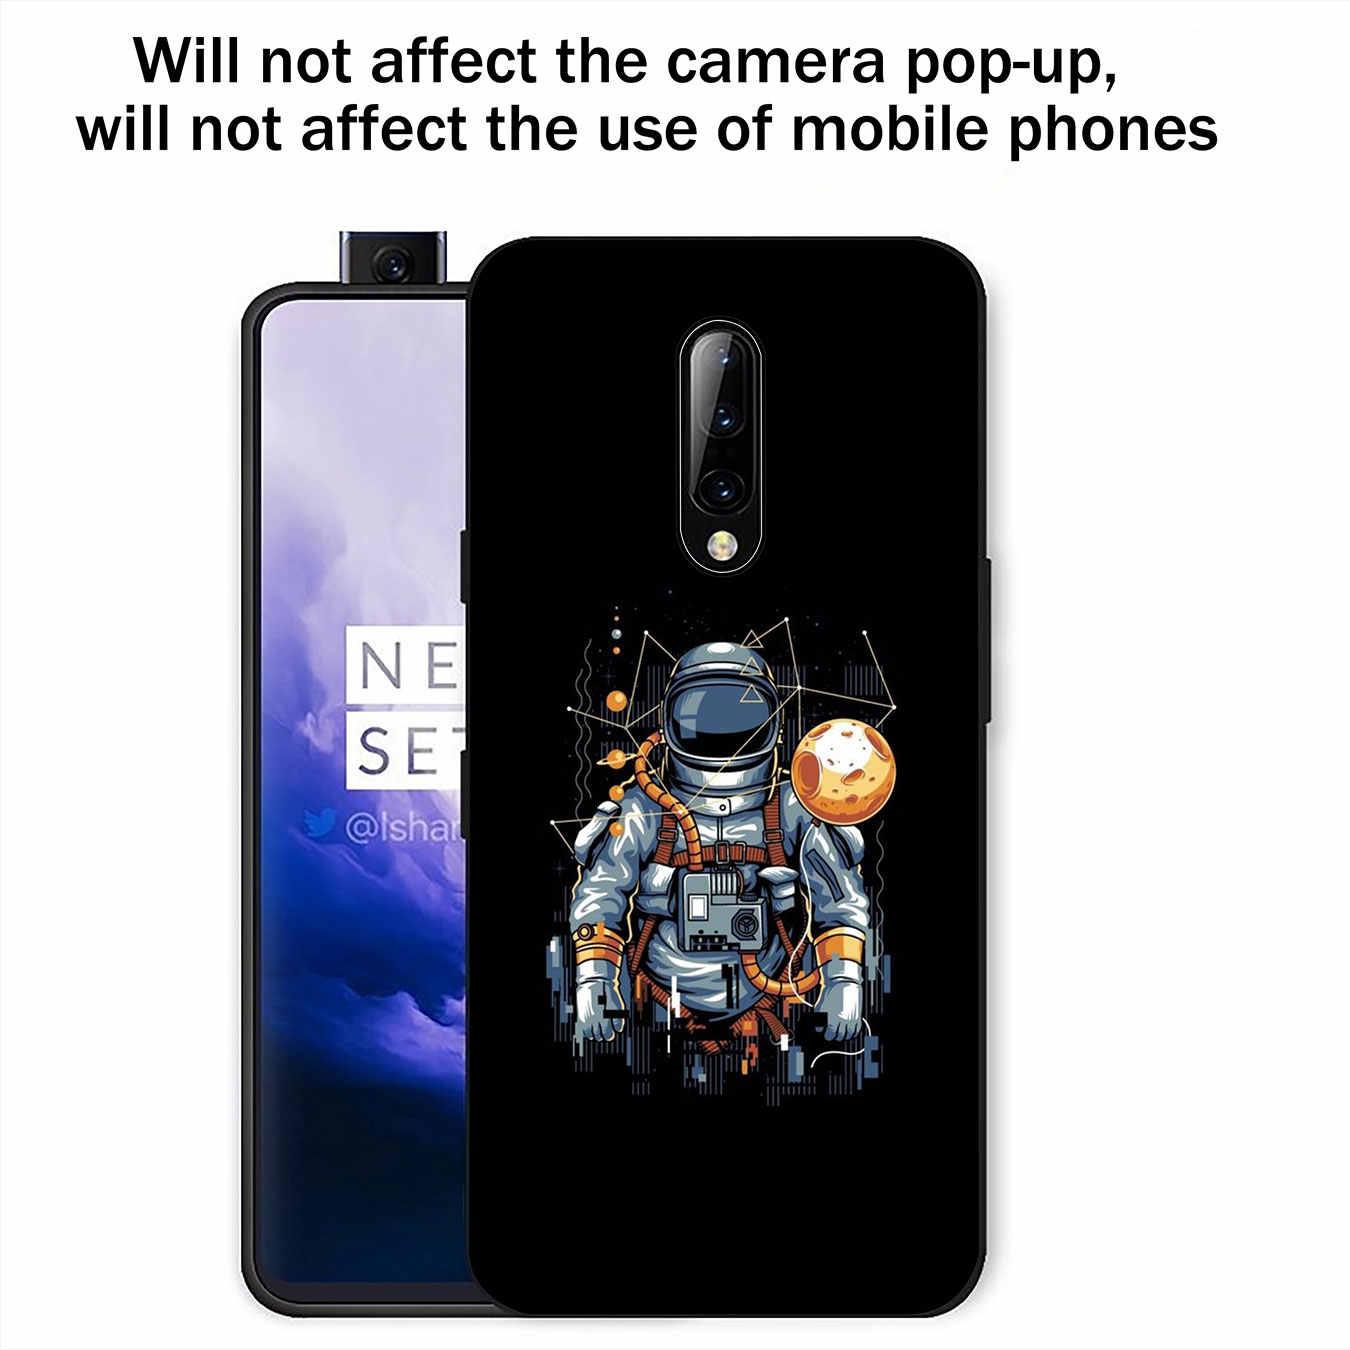 Uzay Siyah Uzay Astronot Ay Yumuşak TPU Siyah Silikon telefon kılıfı OnePlus 7 Pro 6 6T 5 5T bir Artı 7Pro Kapak